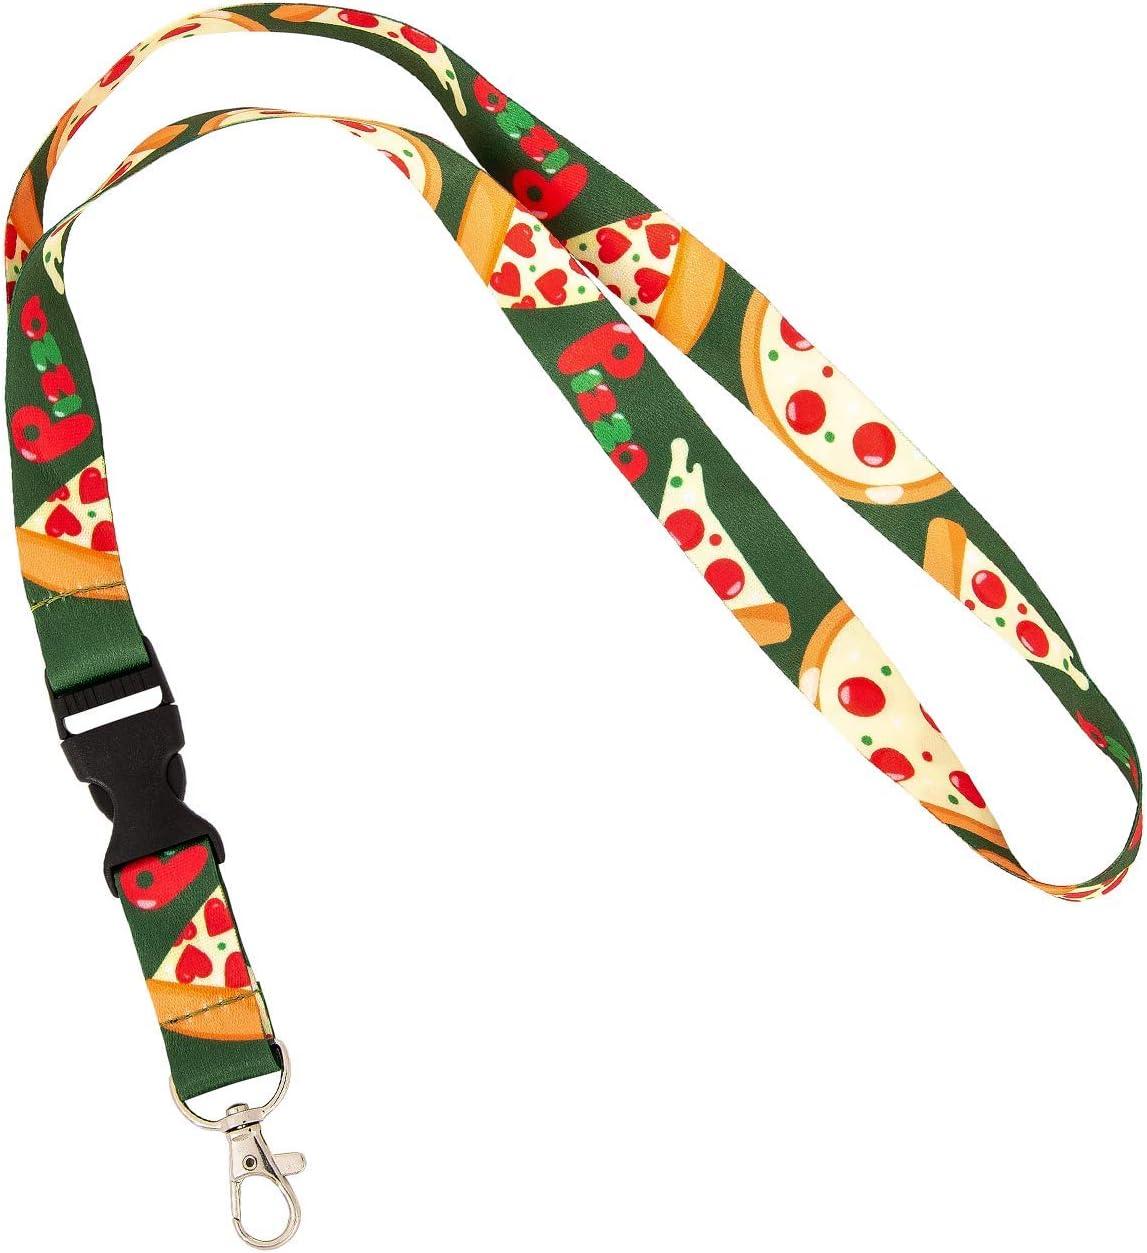 Pizza Food Lanyard Badge ID Car Keys Keychain Souvenir Holder Nurse Doctor Teacher Office Detachable Breakaway Snap Buckle (Design 3)